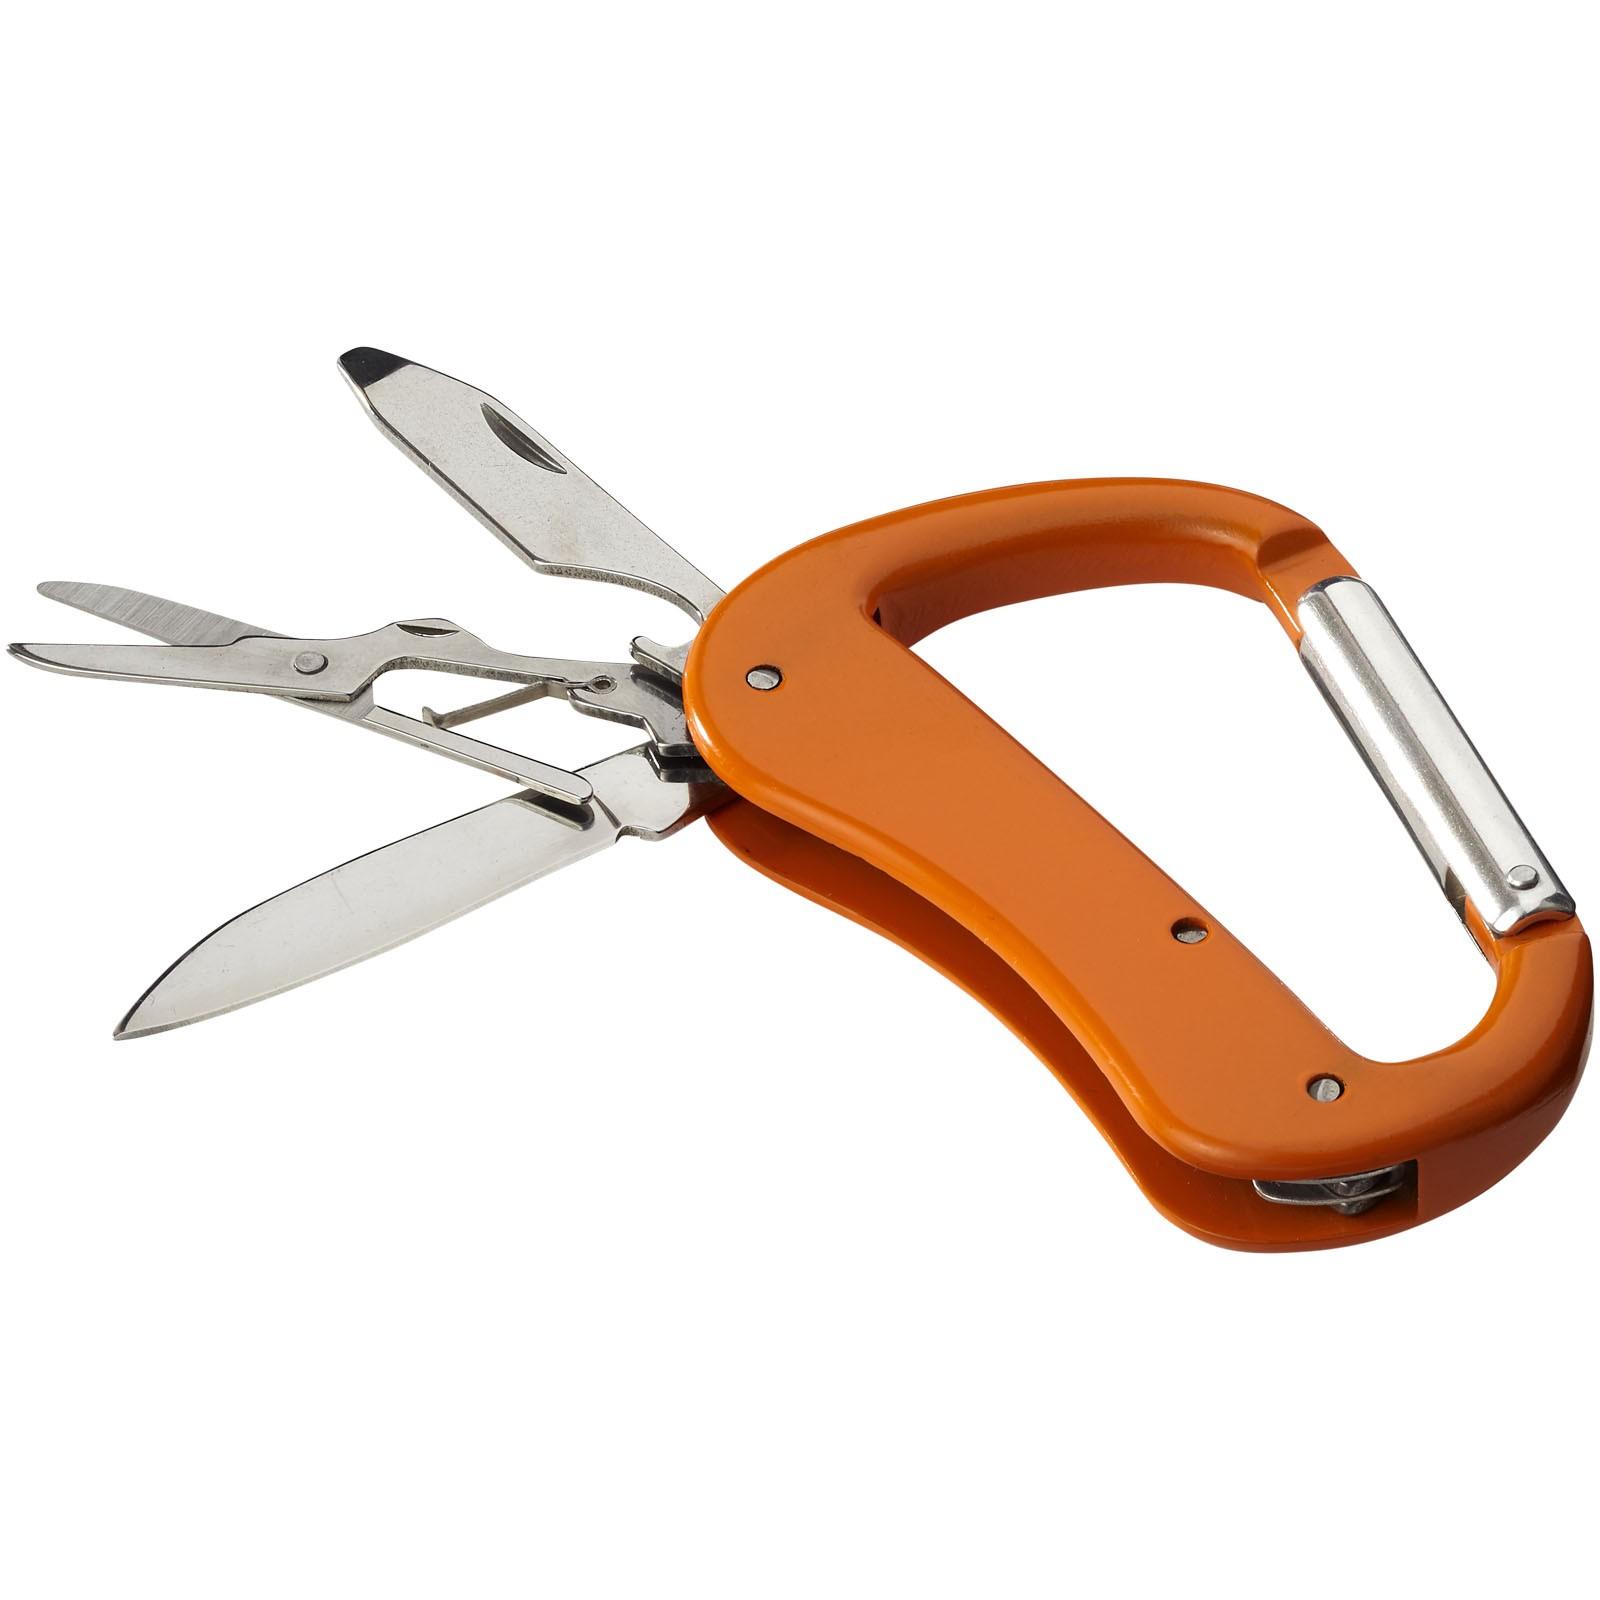 Nůž Canyon s karabinou a 5 funkcemi - 0ranžová